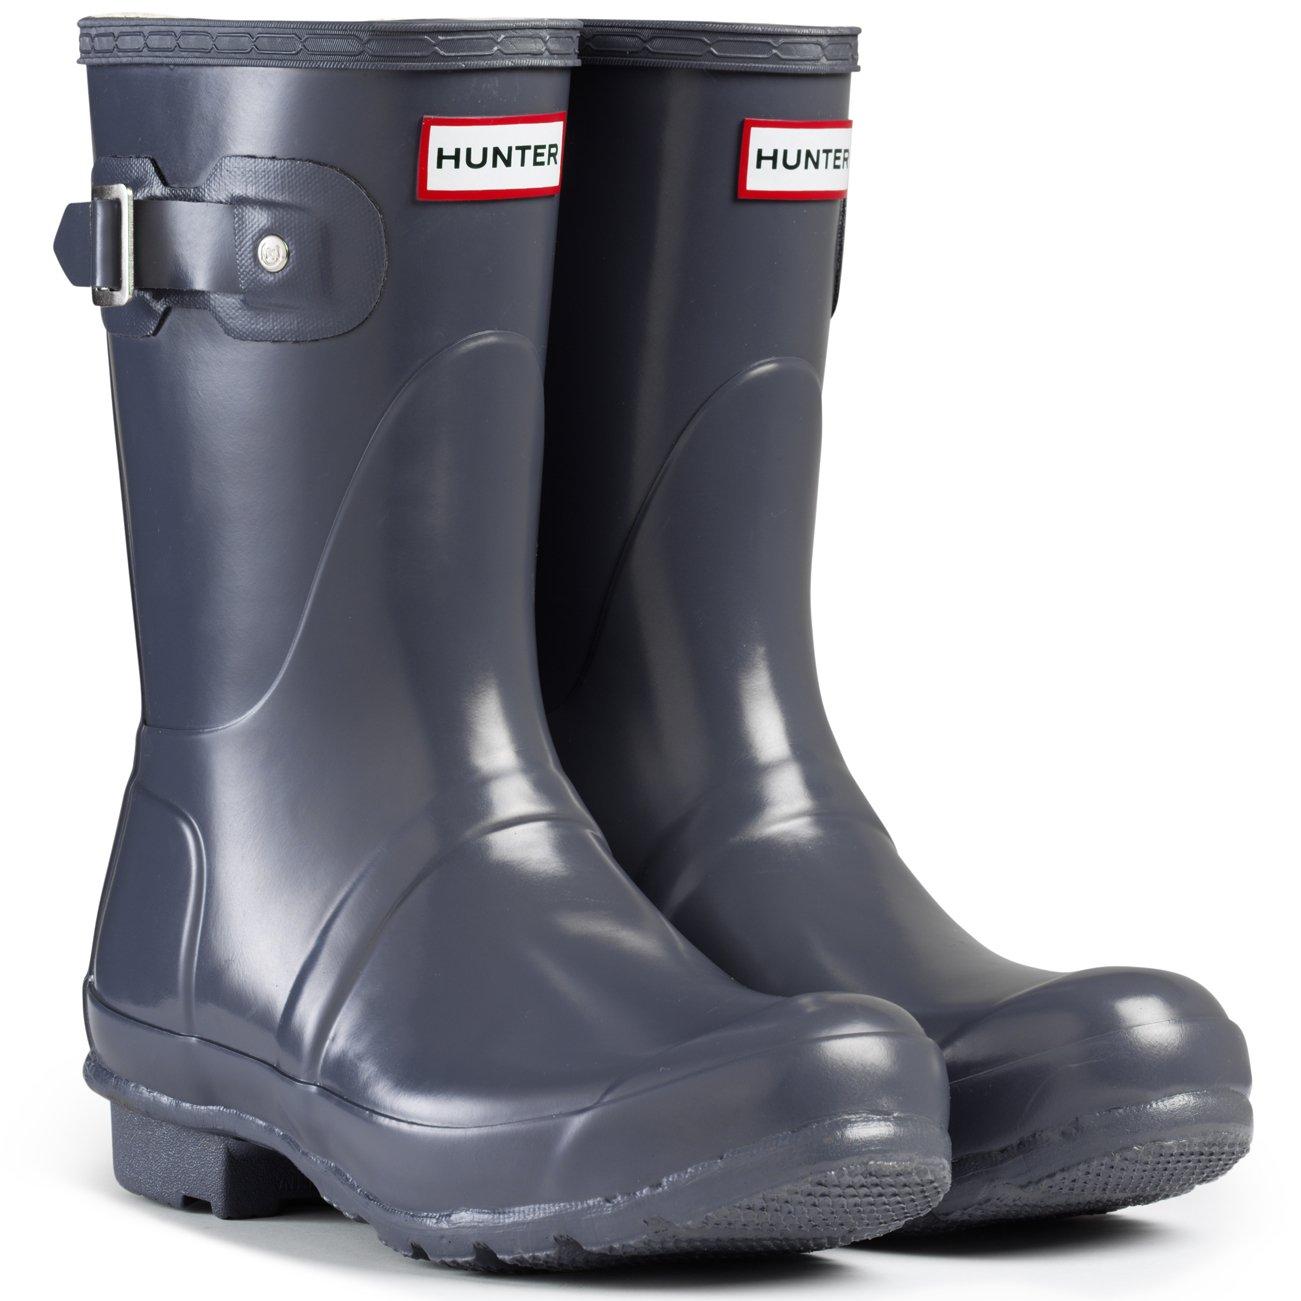 Hunter-WFS1000RGL-Women-039-s-Original-Short-Gloss-Boots-All-Colors thumbnail 21